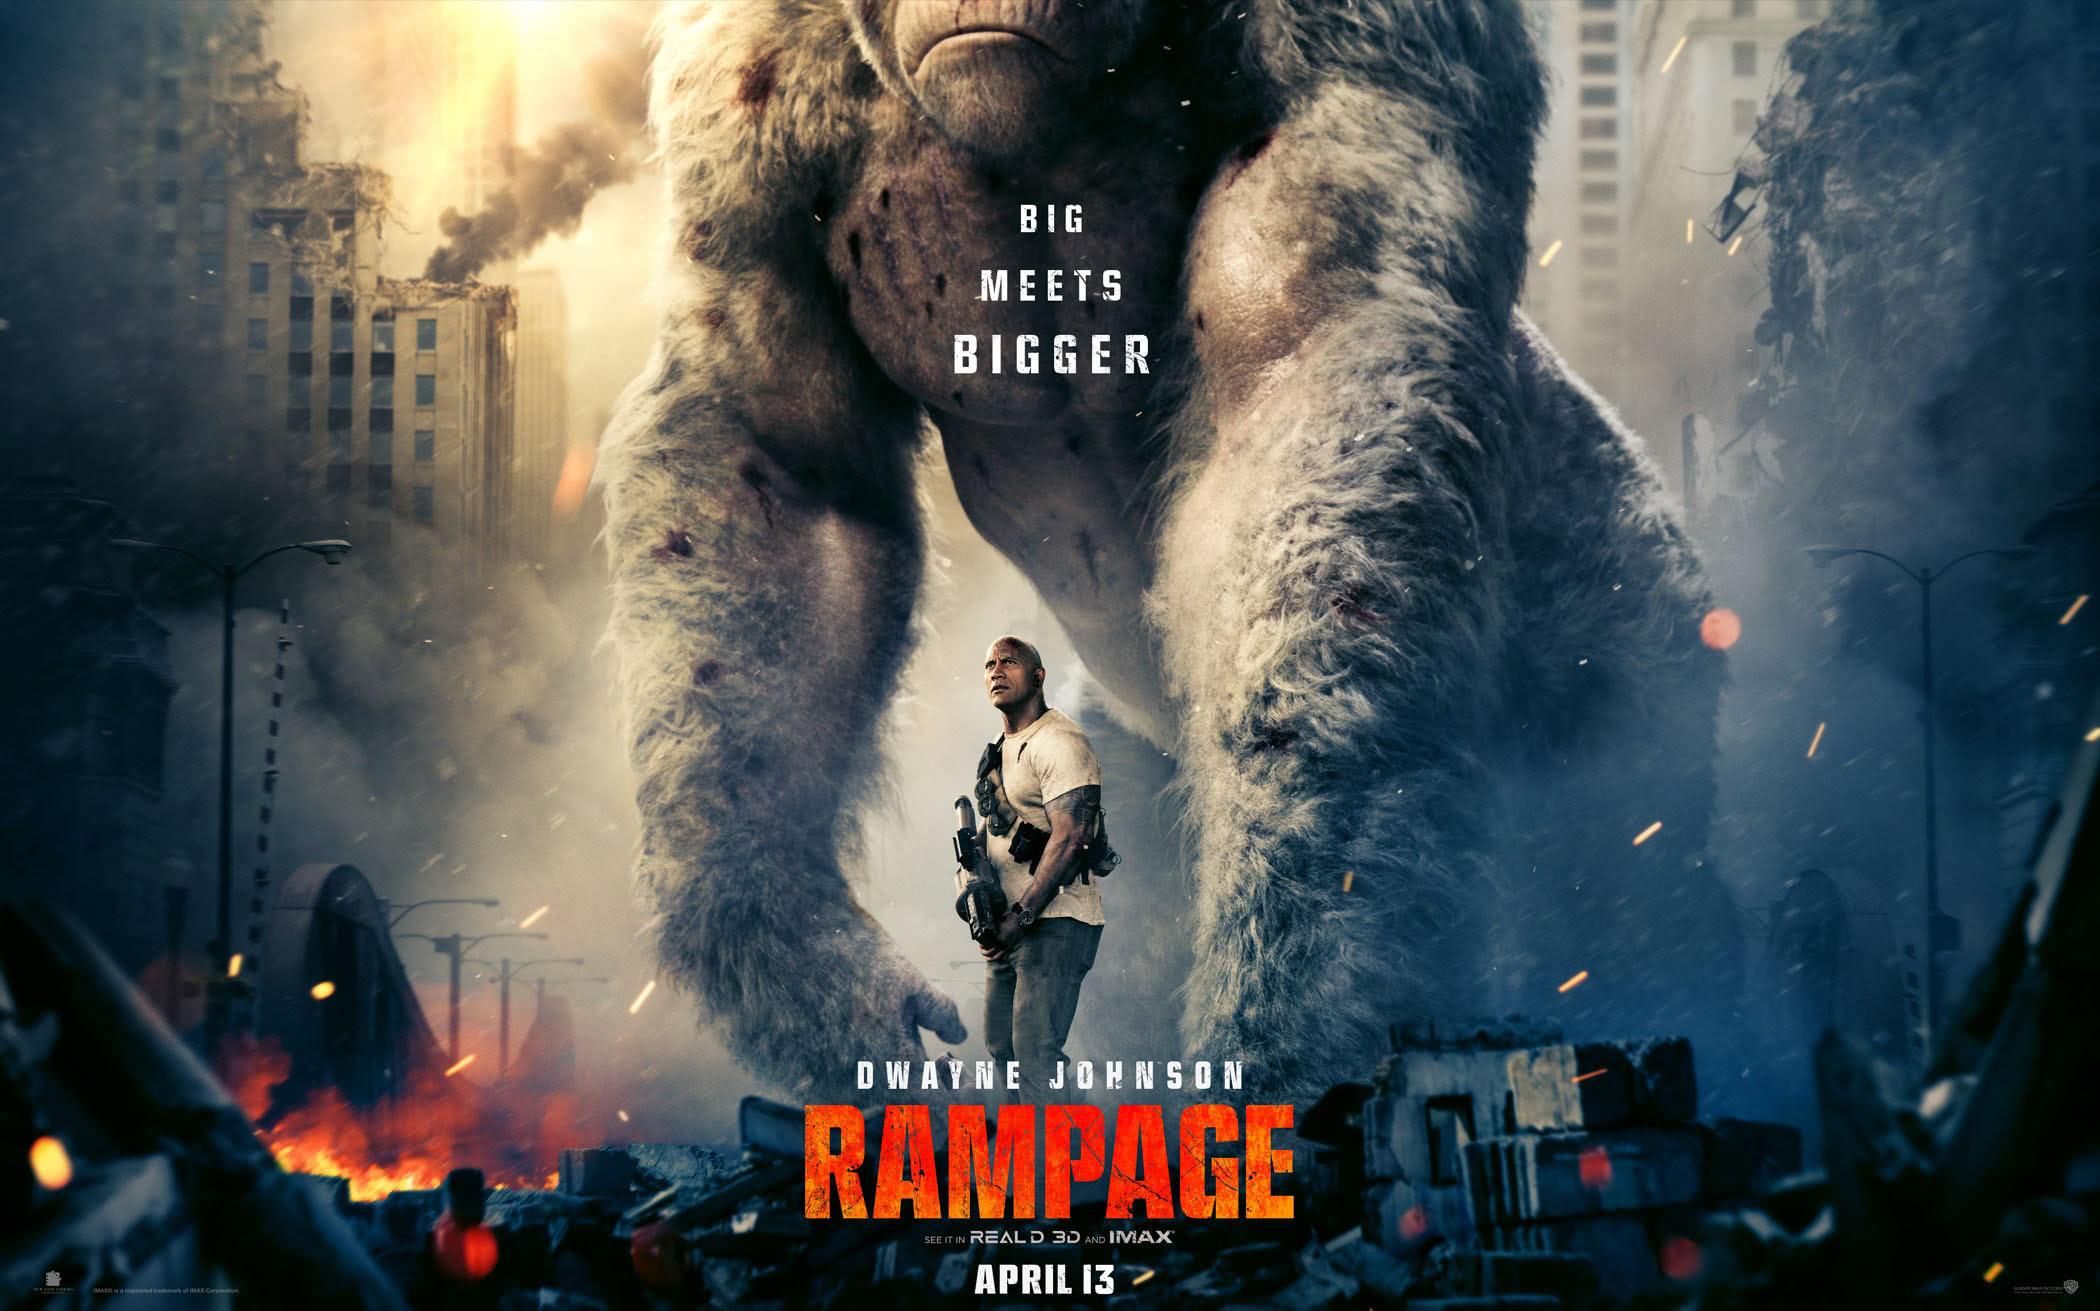 Rampage แรมเพจ วายร้ายทำลายล้าง